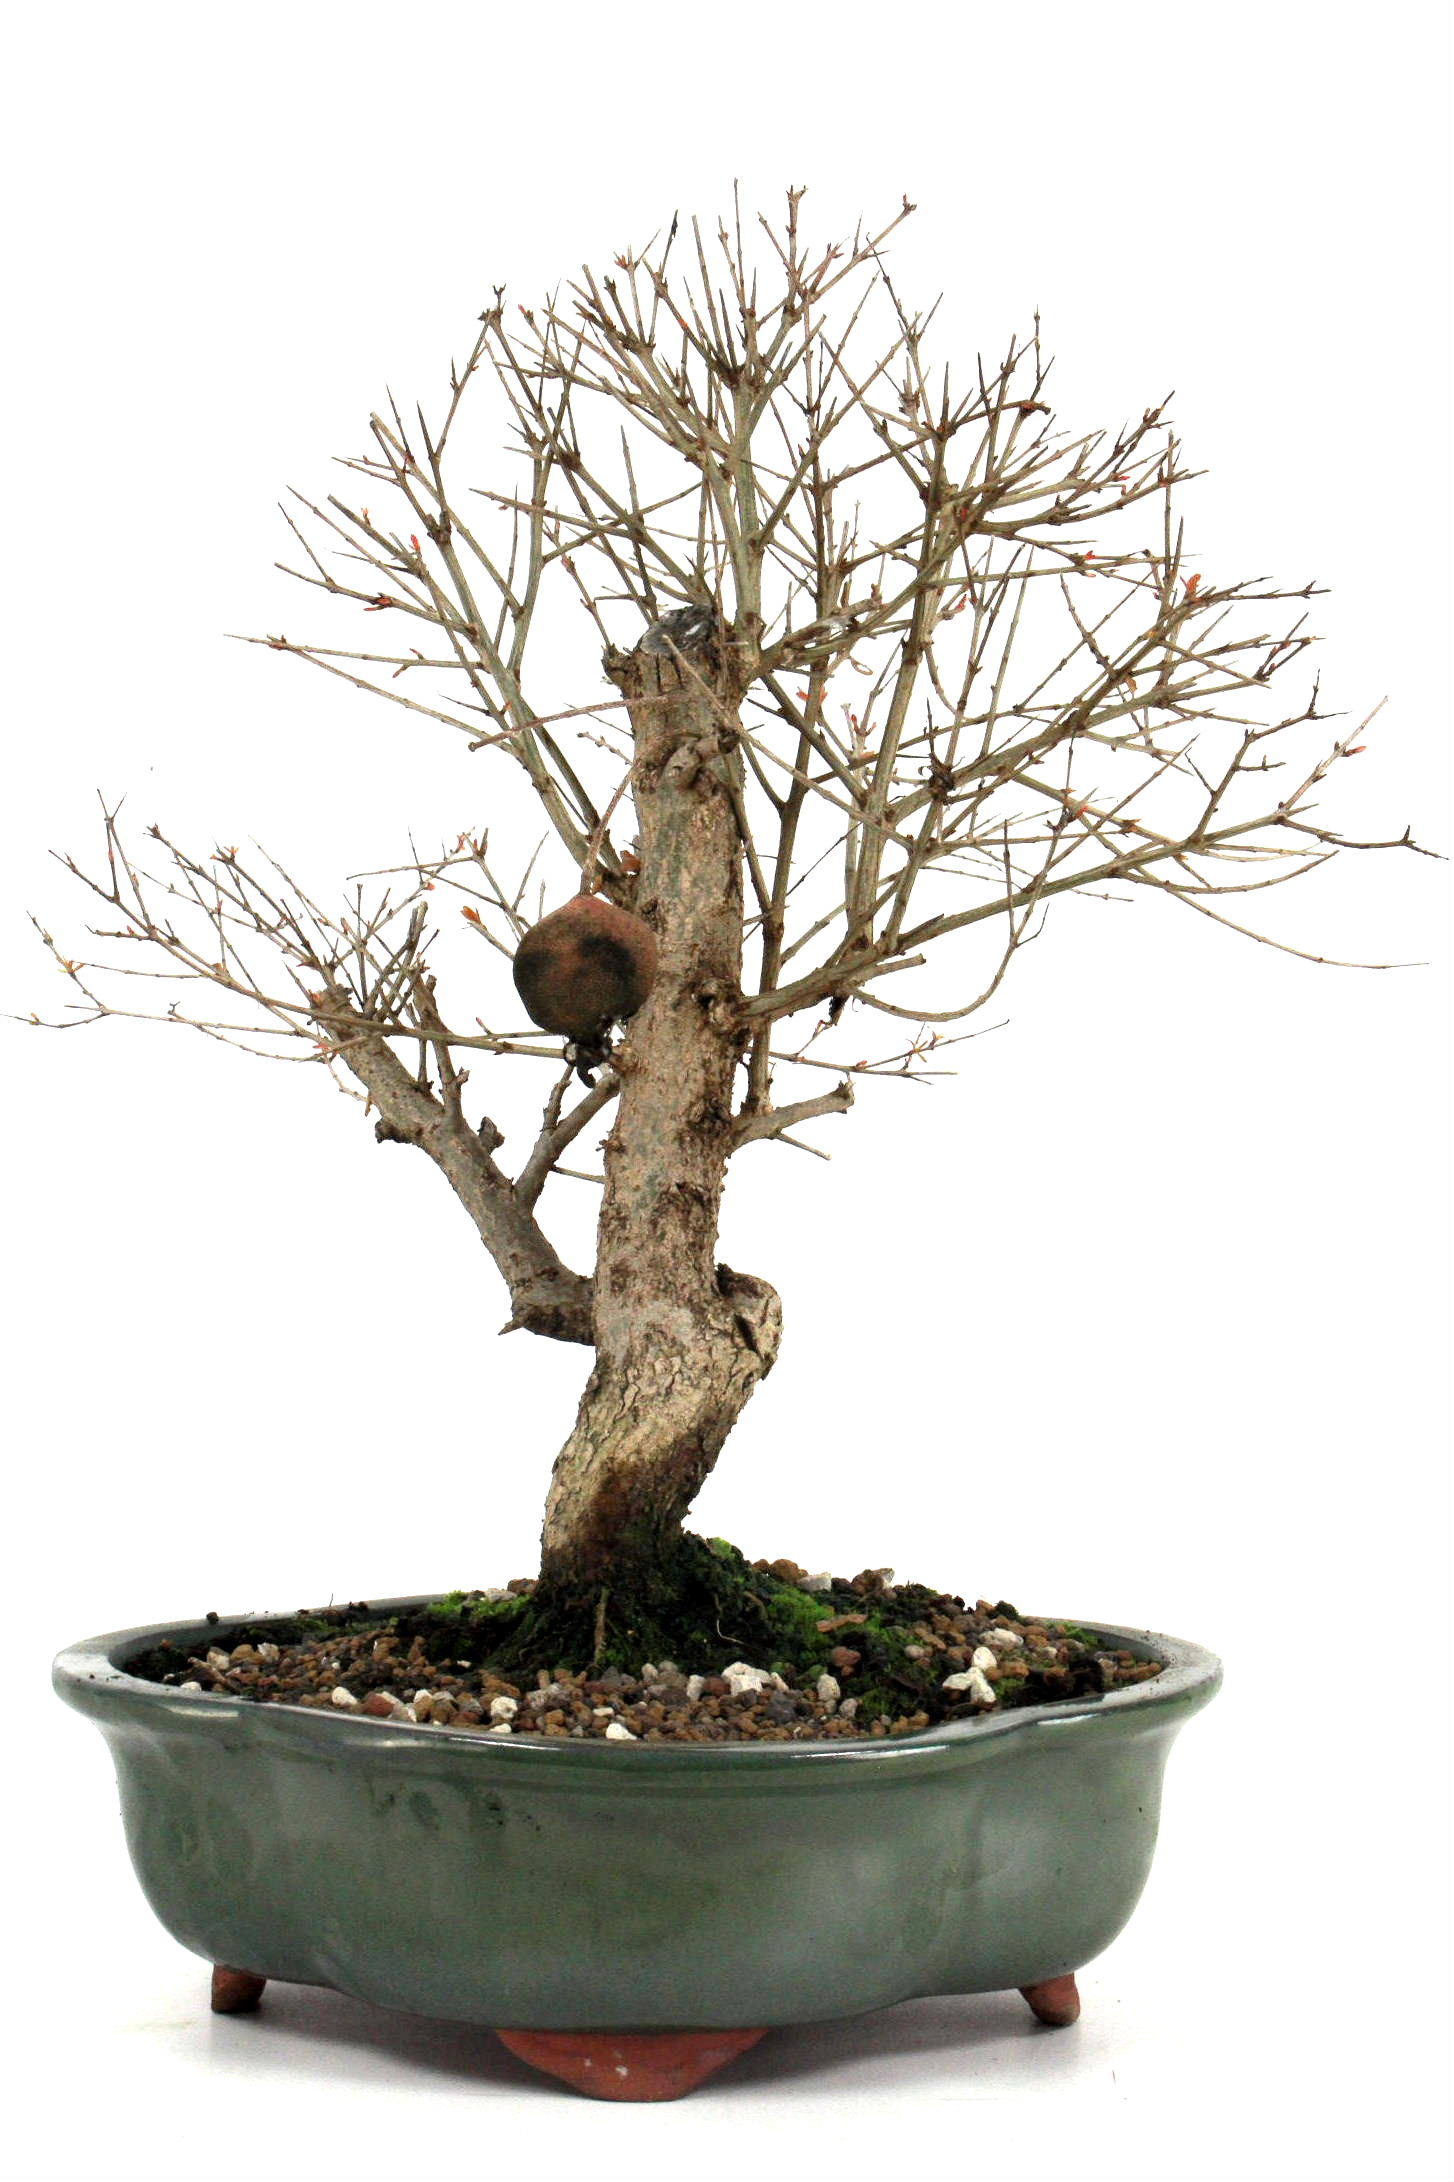 granatapfel bonsai 40 45 cm 251 bei oyaki bonsai kaufen. Black Bedroom Furniture Sets. Home Design Ideas